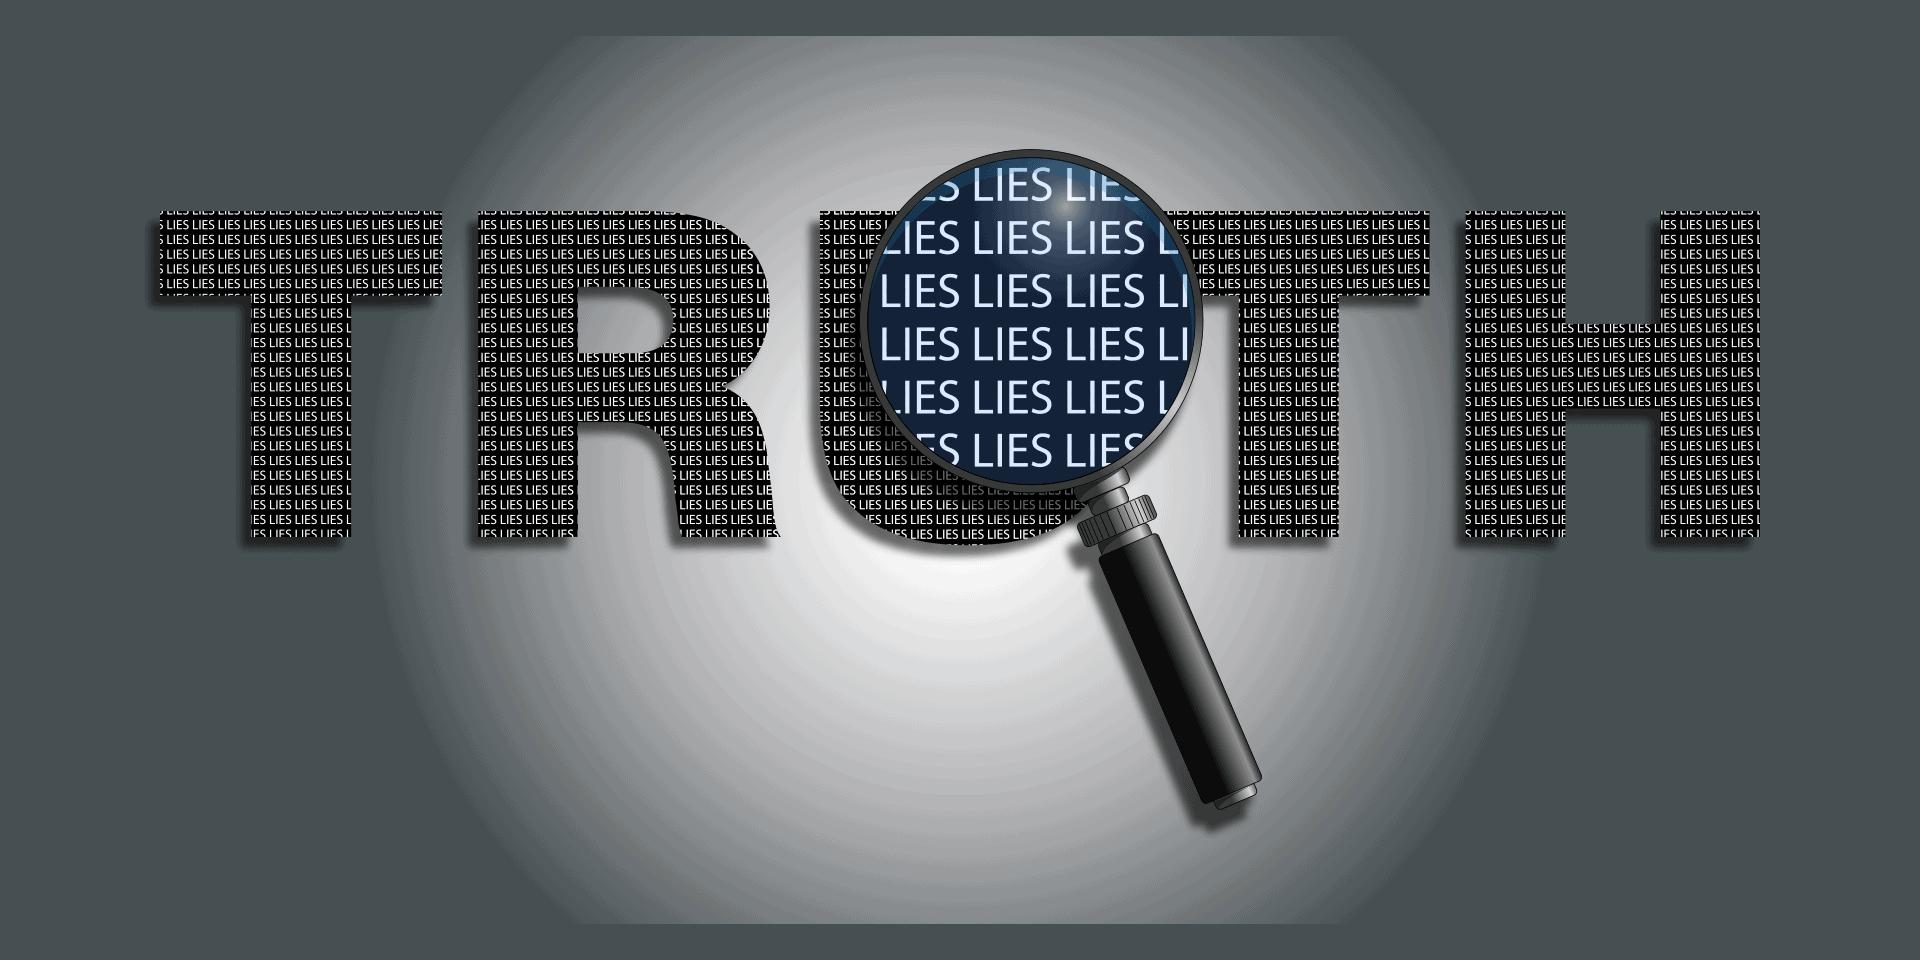 deceive, deception, lies